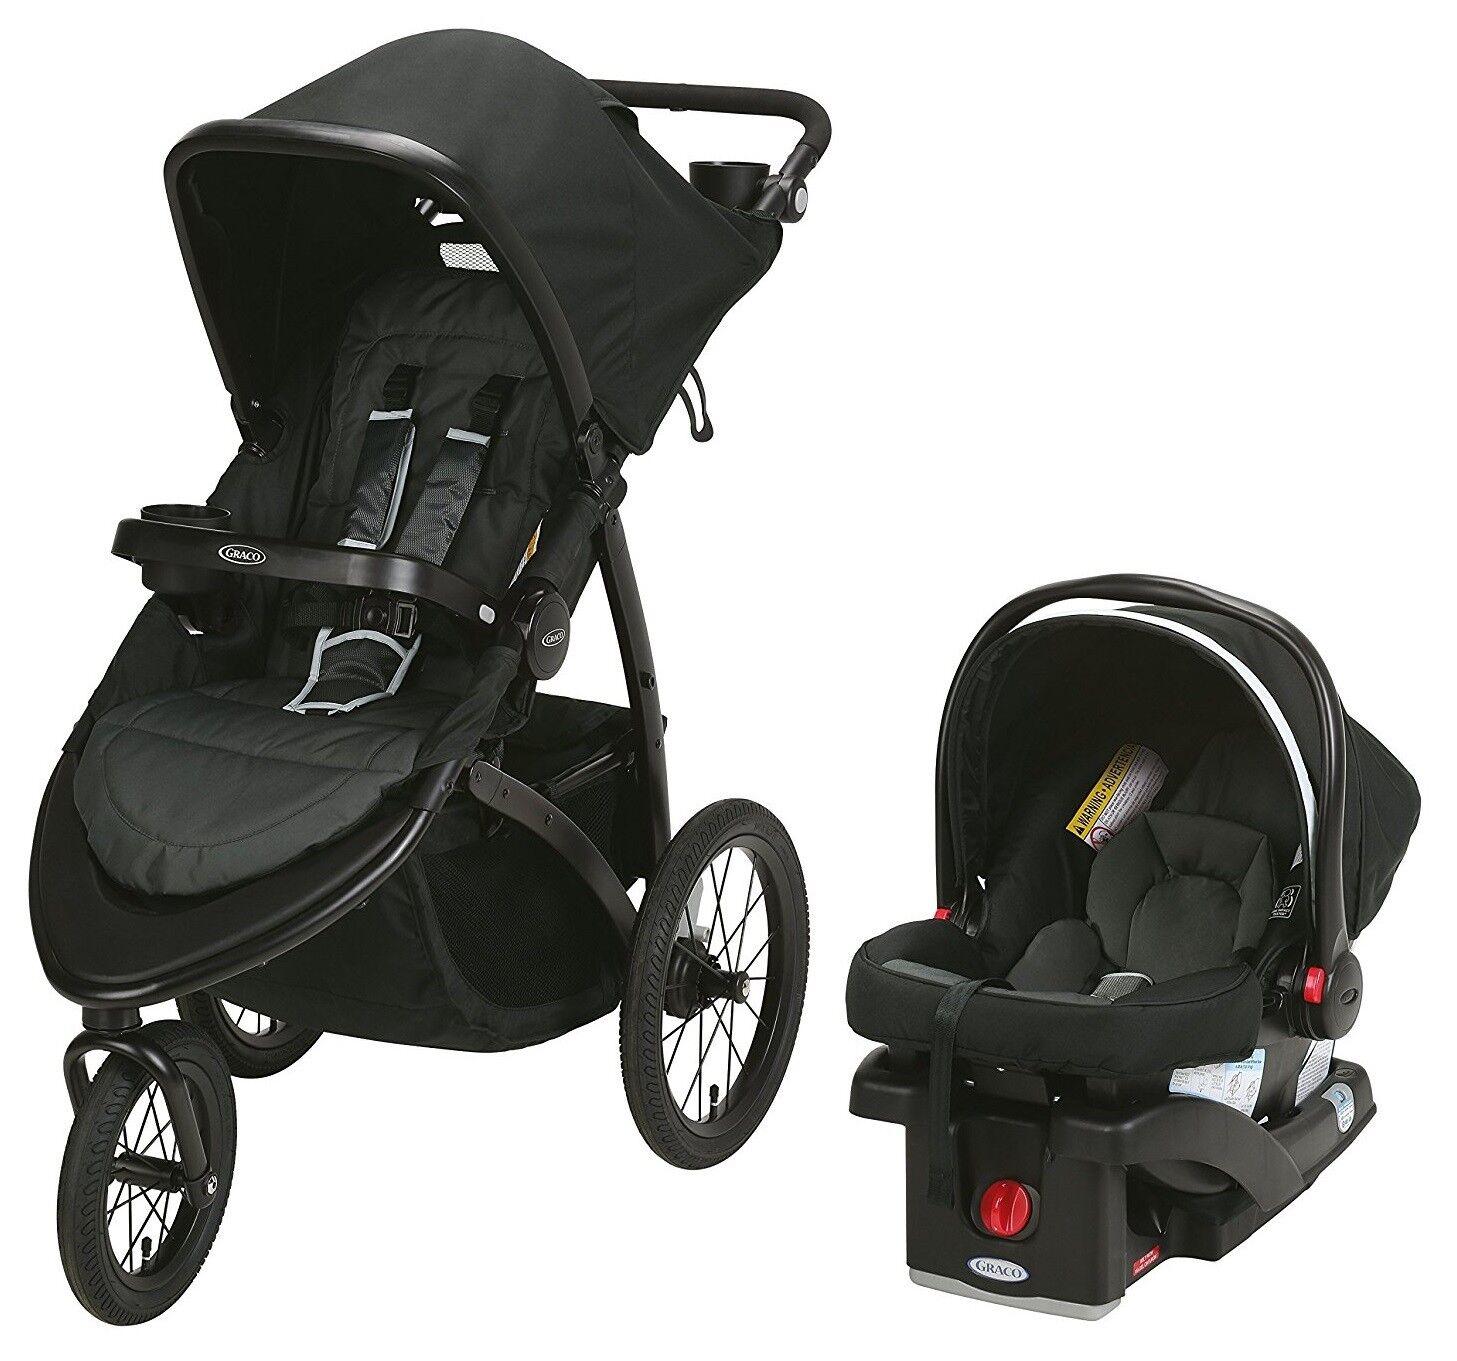 Graco Baby RoadMaster Jogger Travel System Stroller w/ Infan